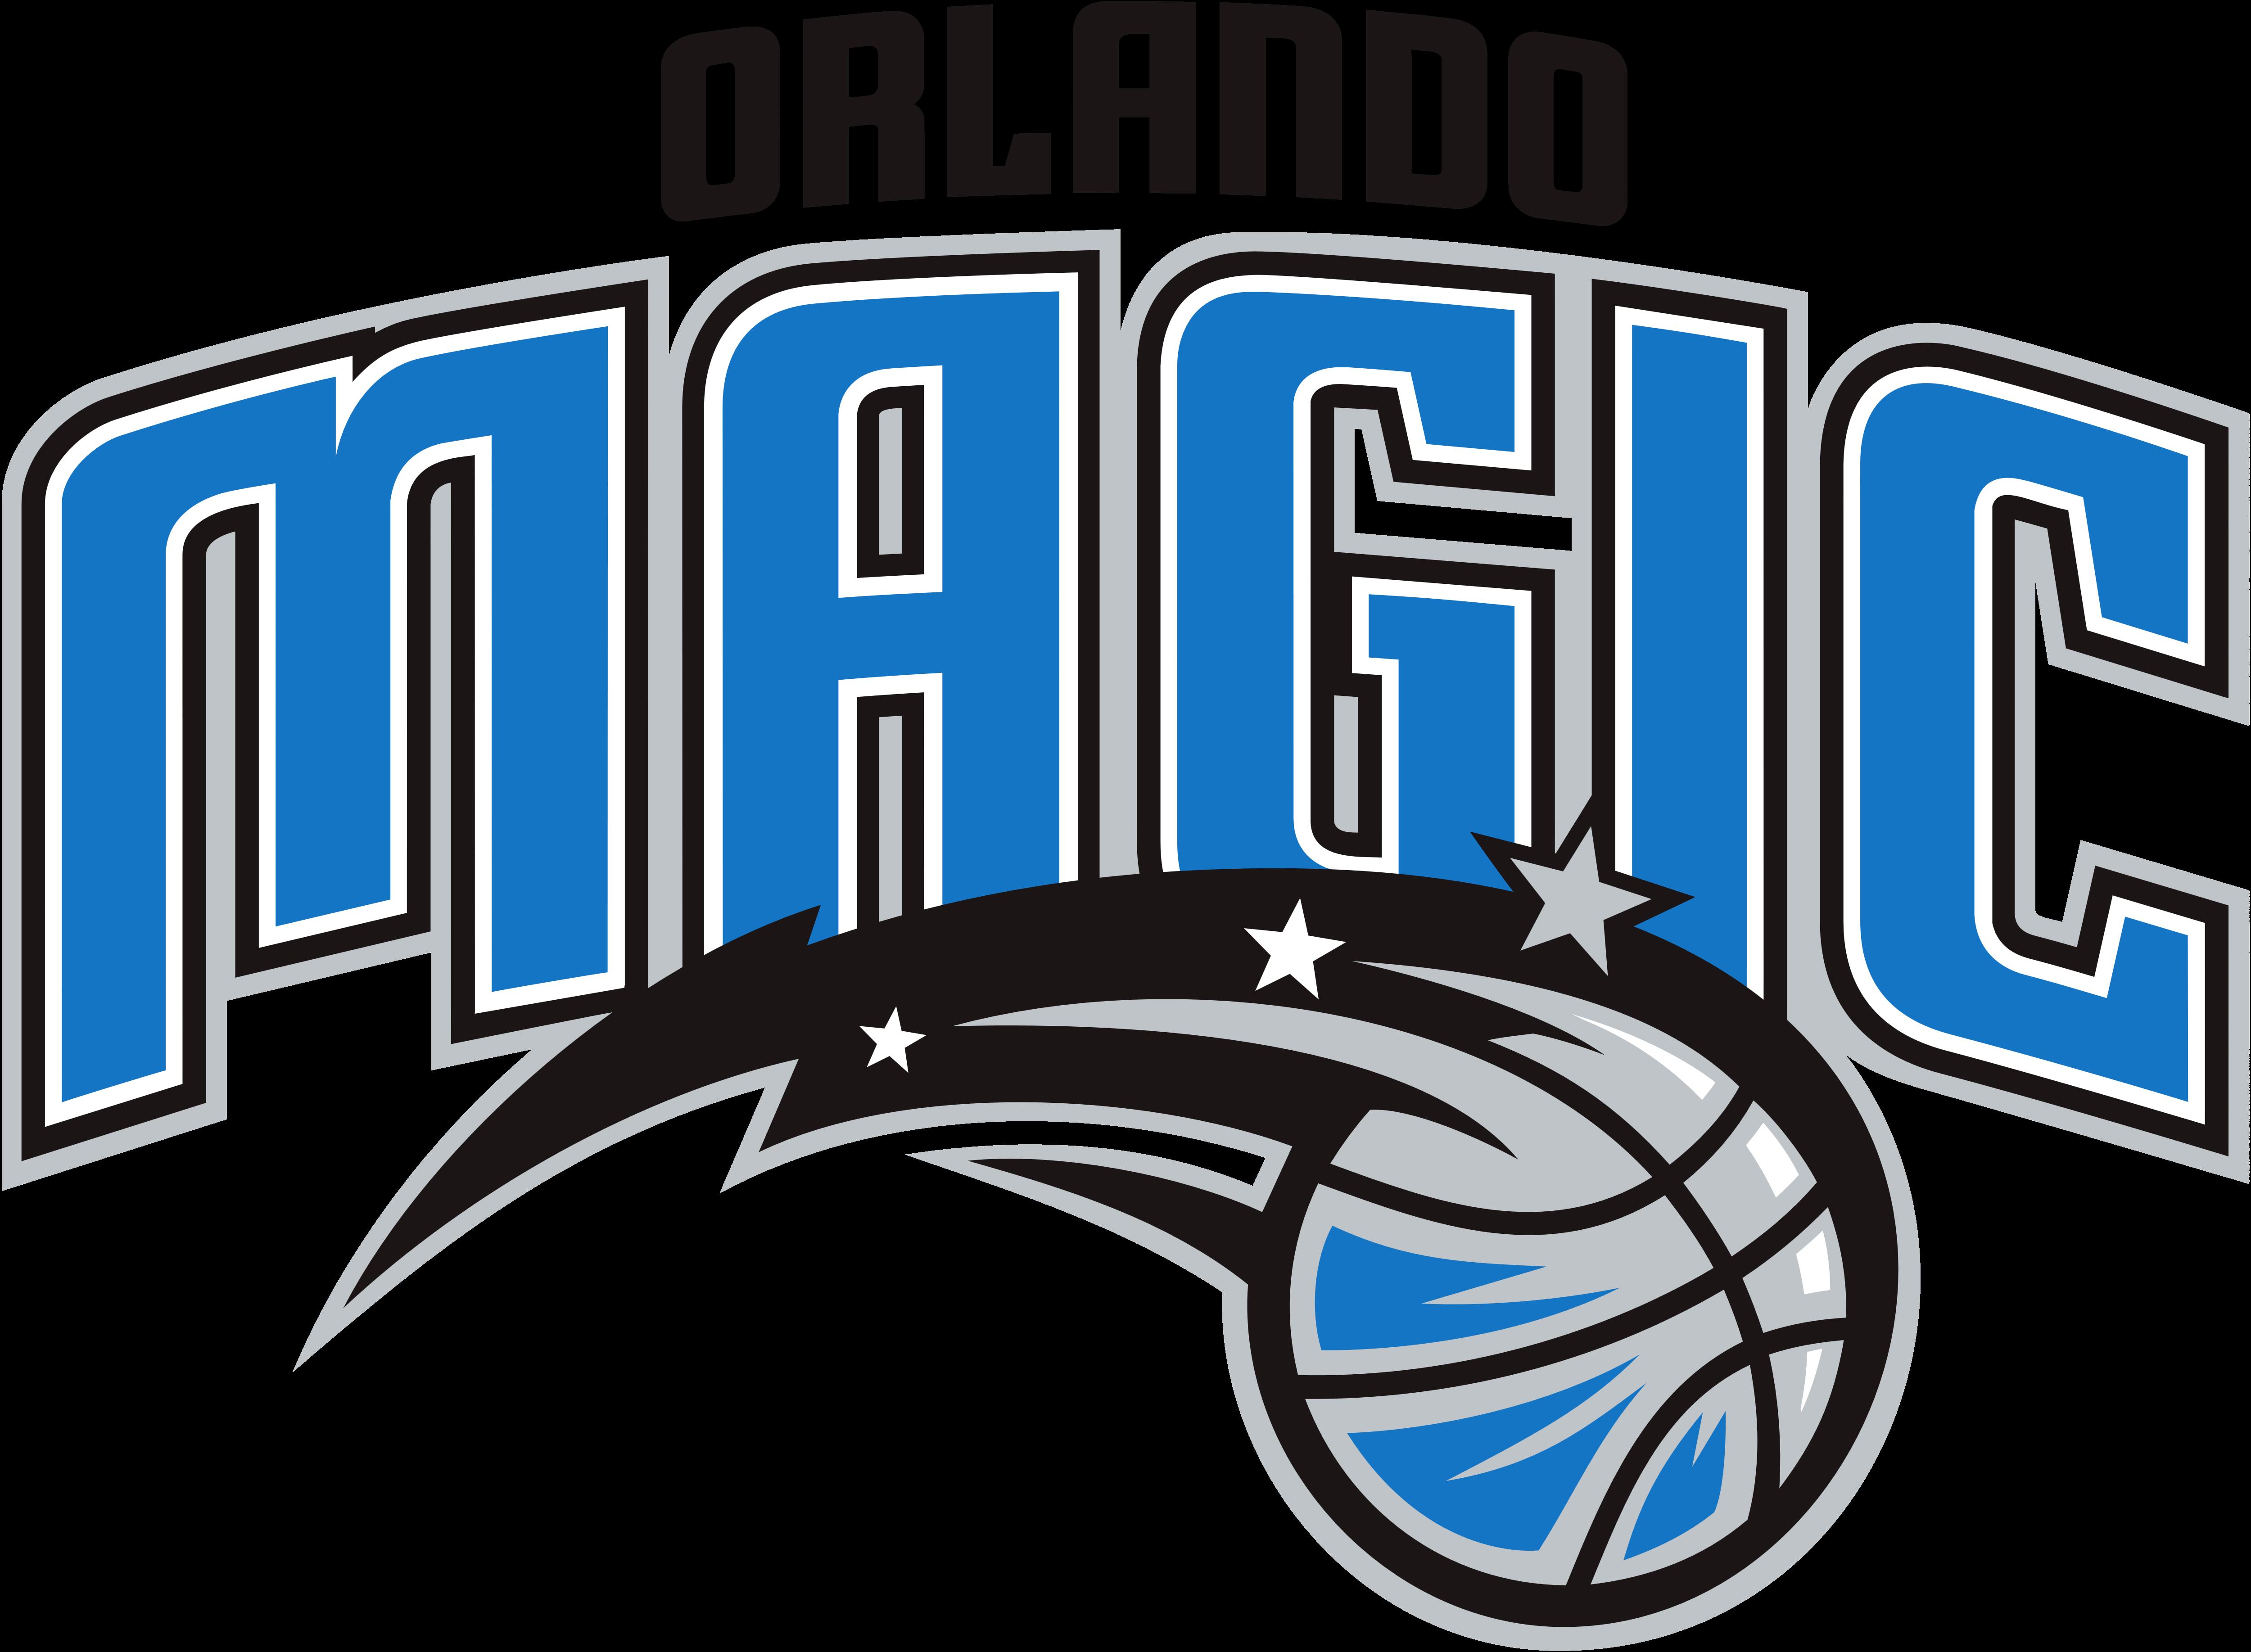 Orlando Magic - Logos Download